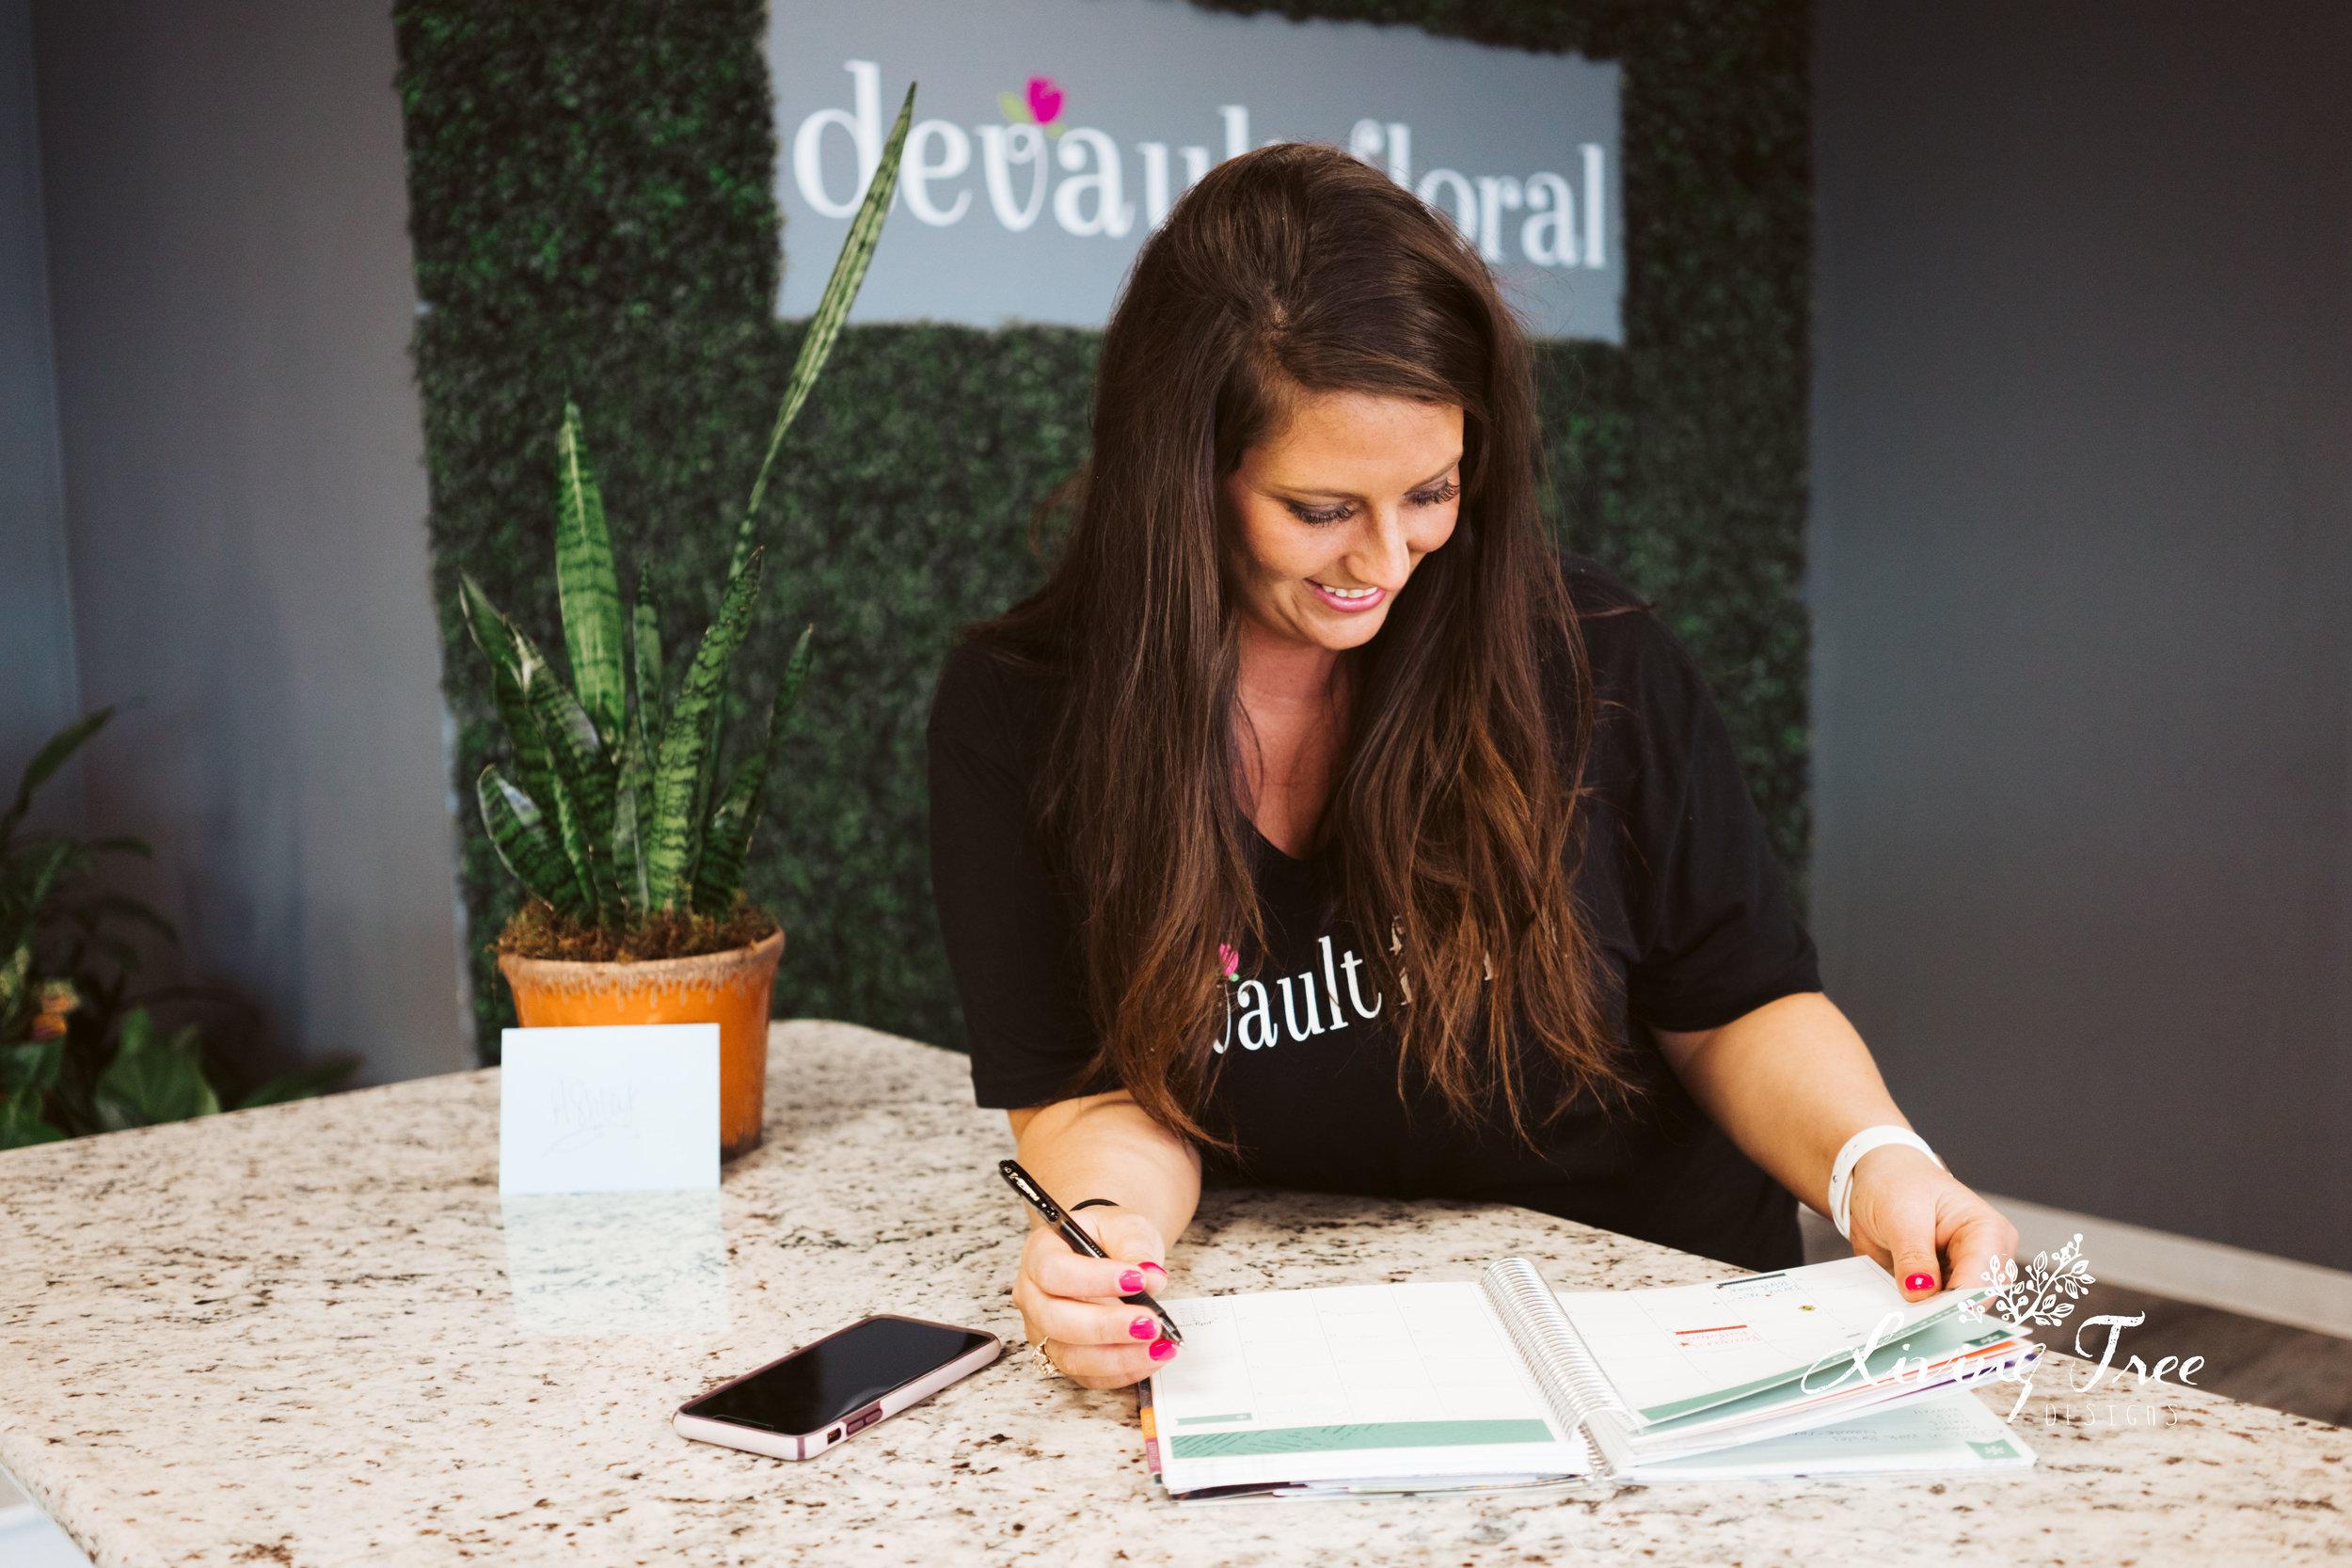 Shyla - Wedding Planning Guru at Devault Floral